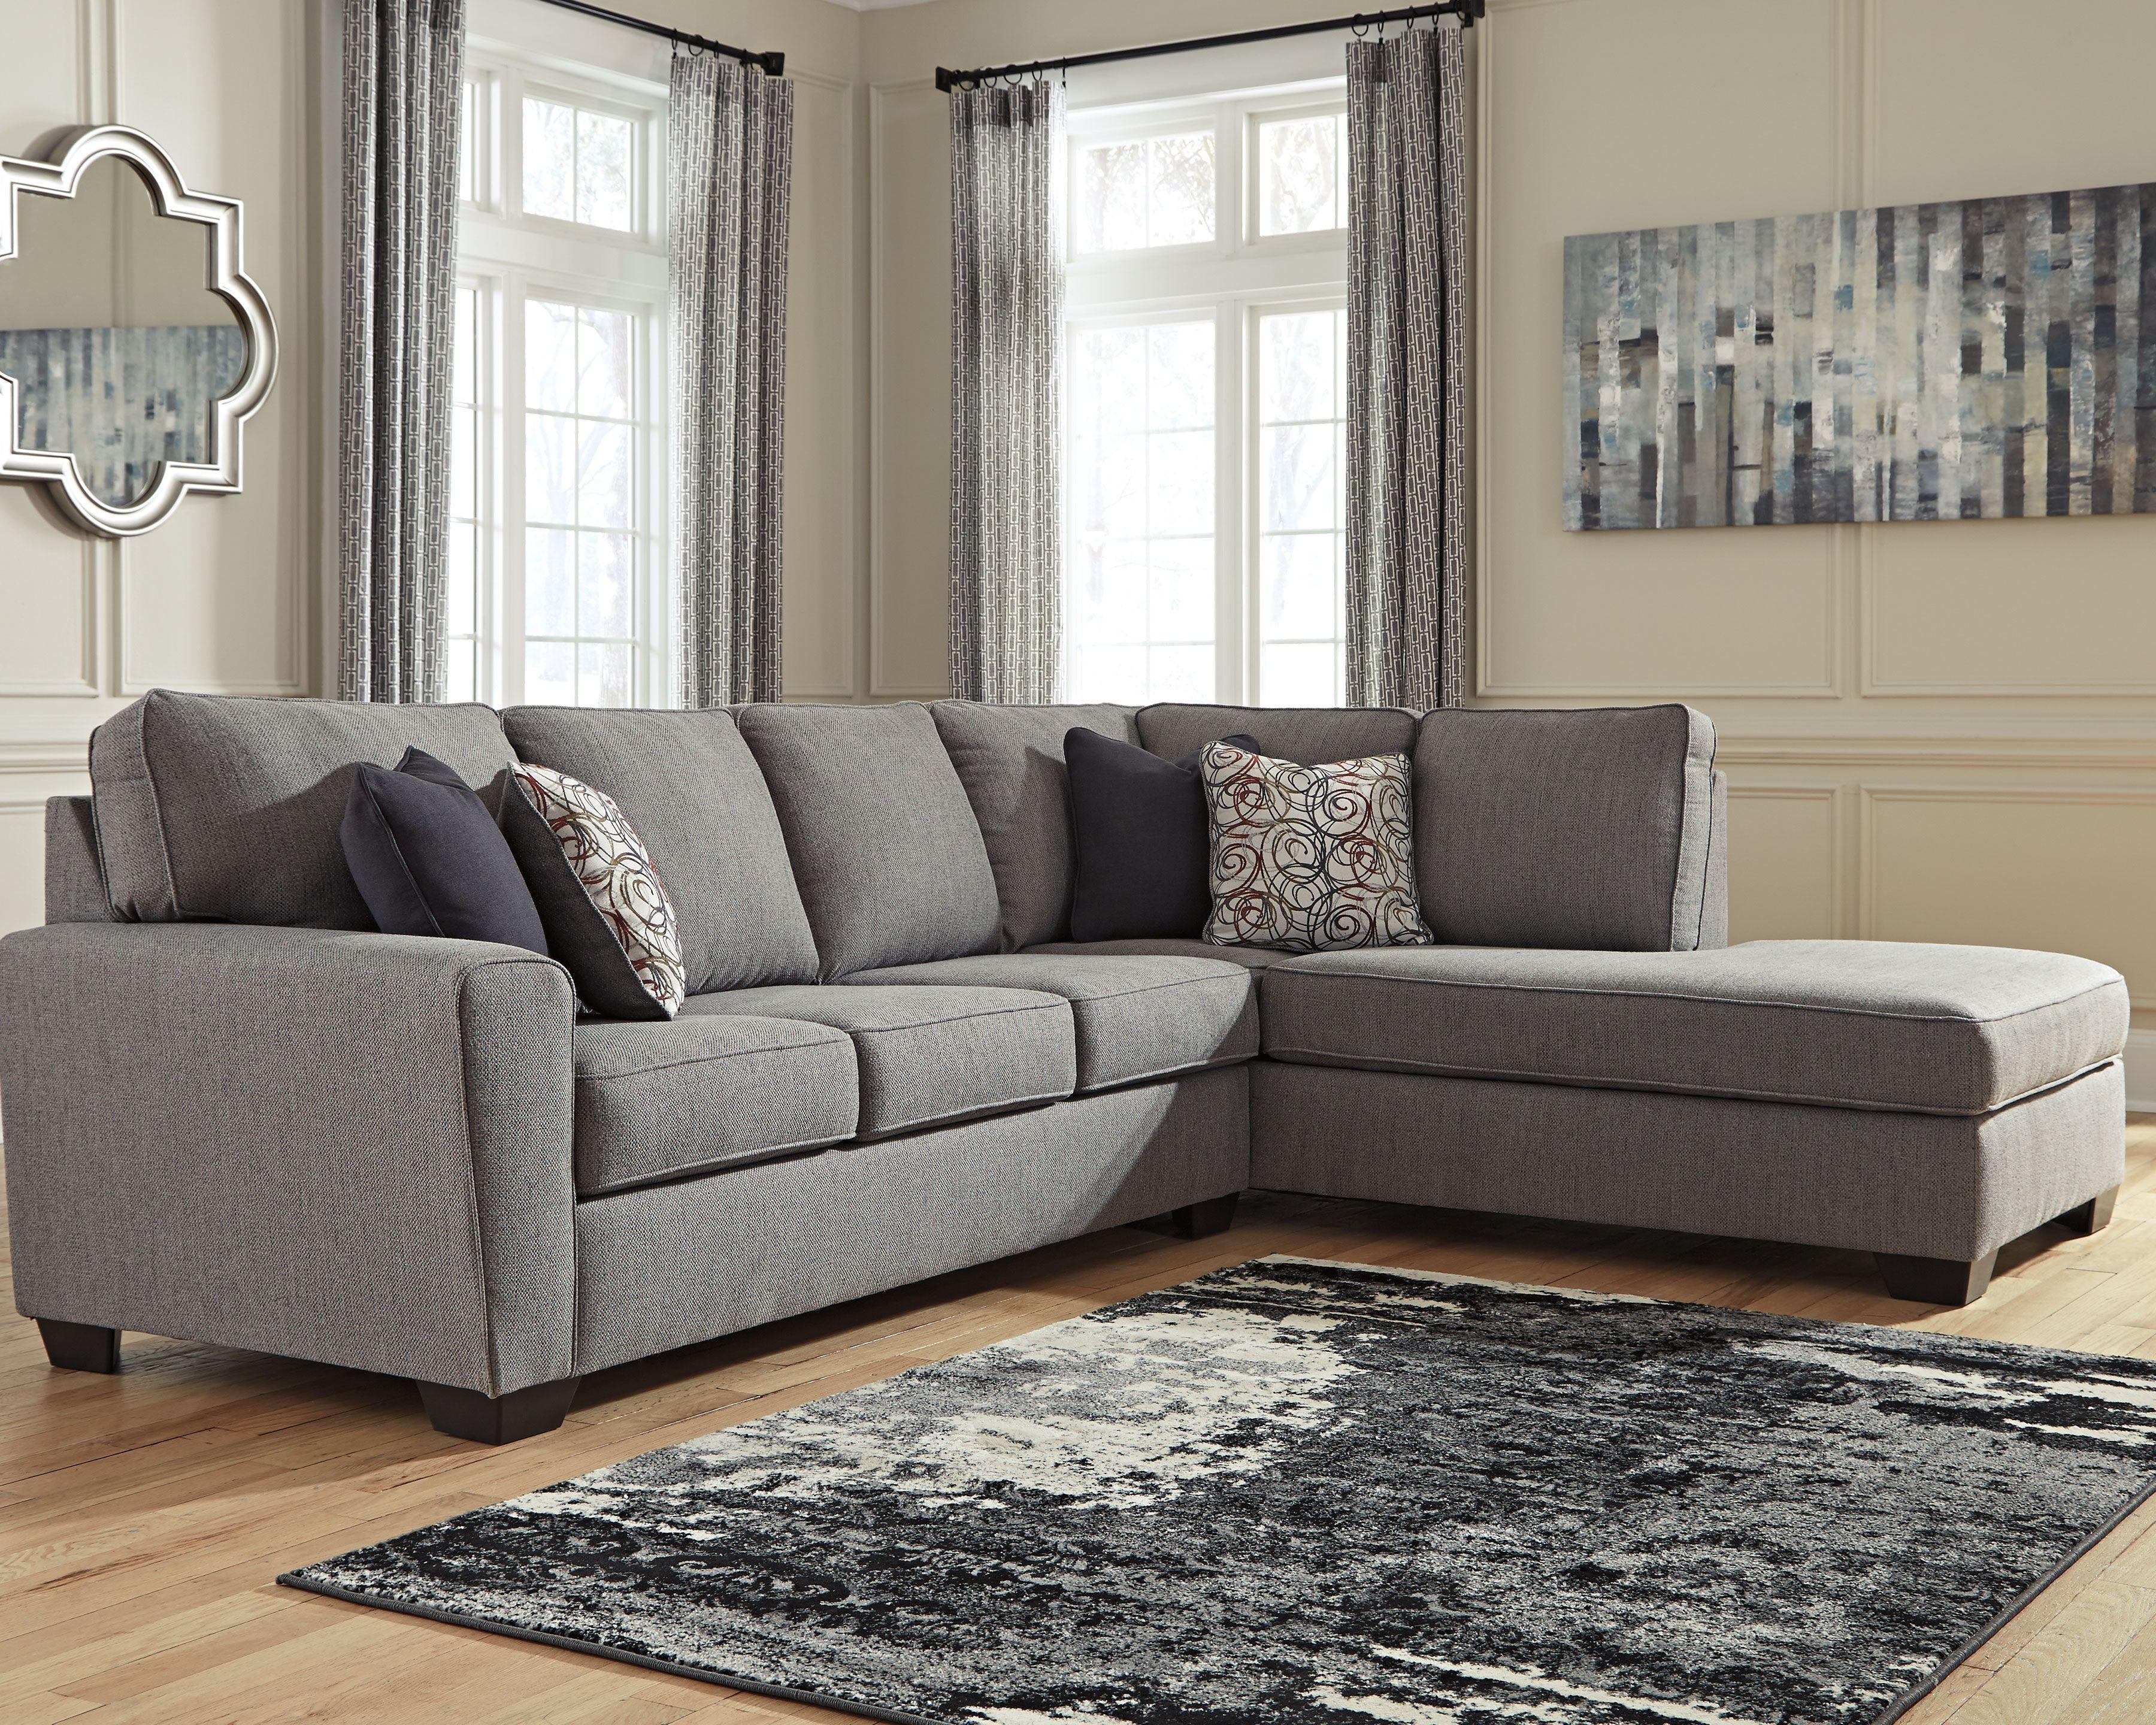 Marvelous Larusi 2 Piece Sectional Iron Grey Sectional Sofa Uwap Interior Chair Design Uwaporg